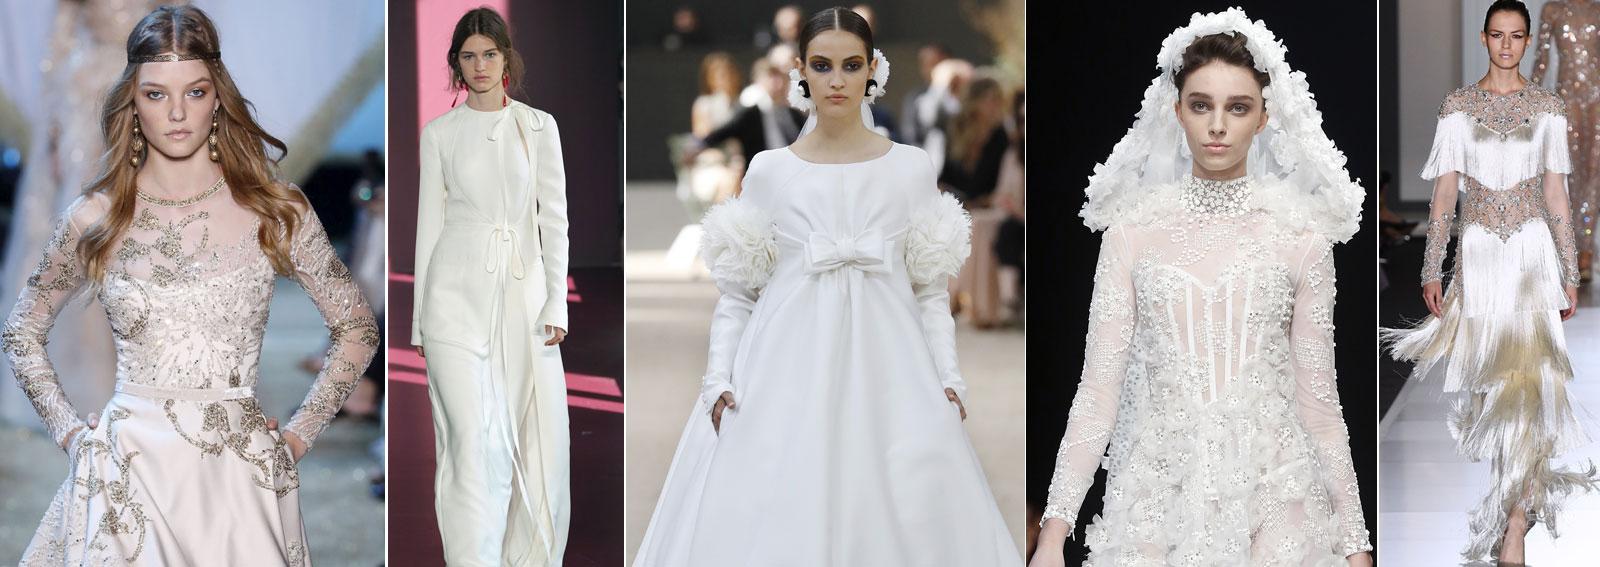 COVER-sposa-haute-couture-2017-18-DESKTOP